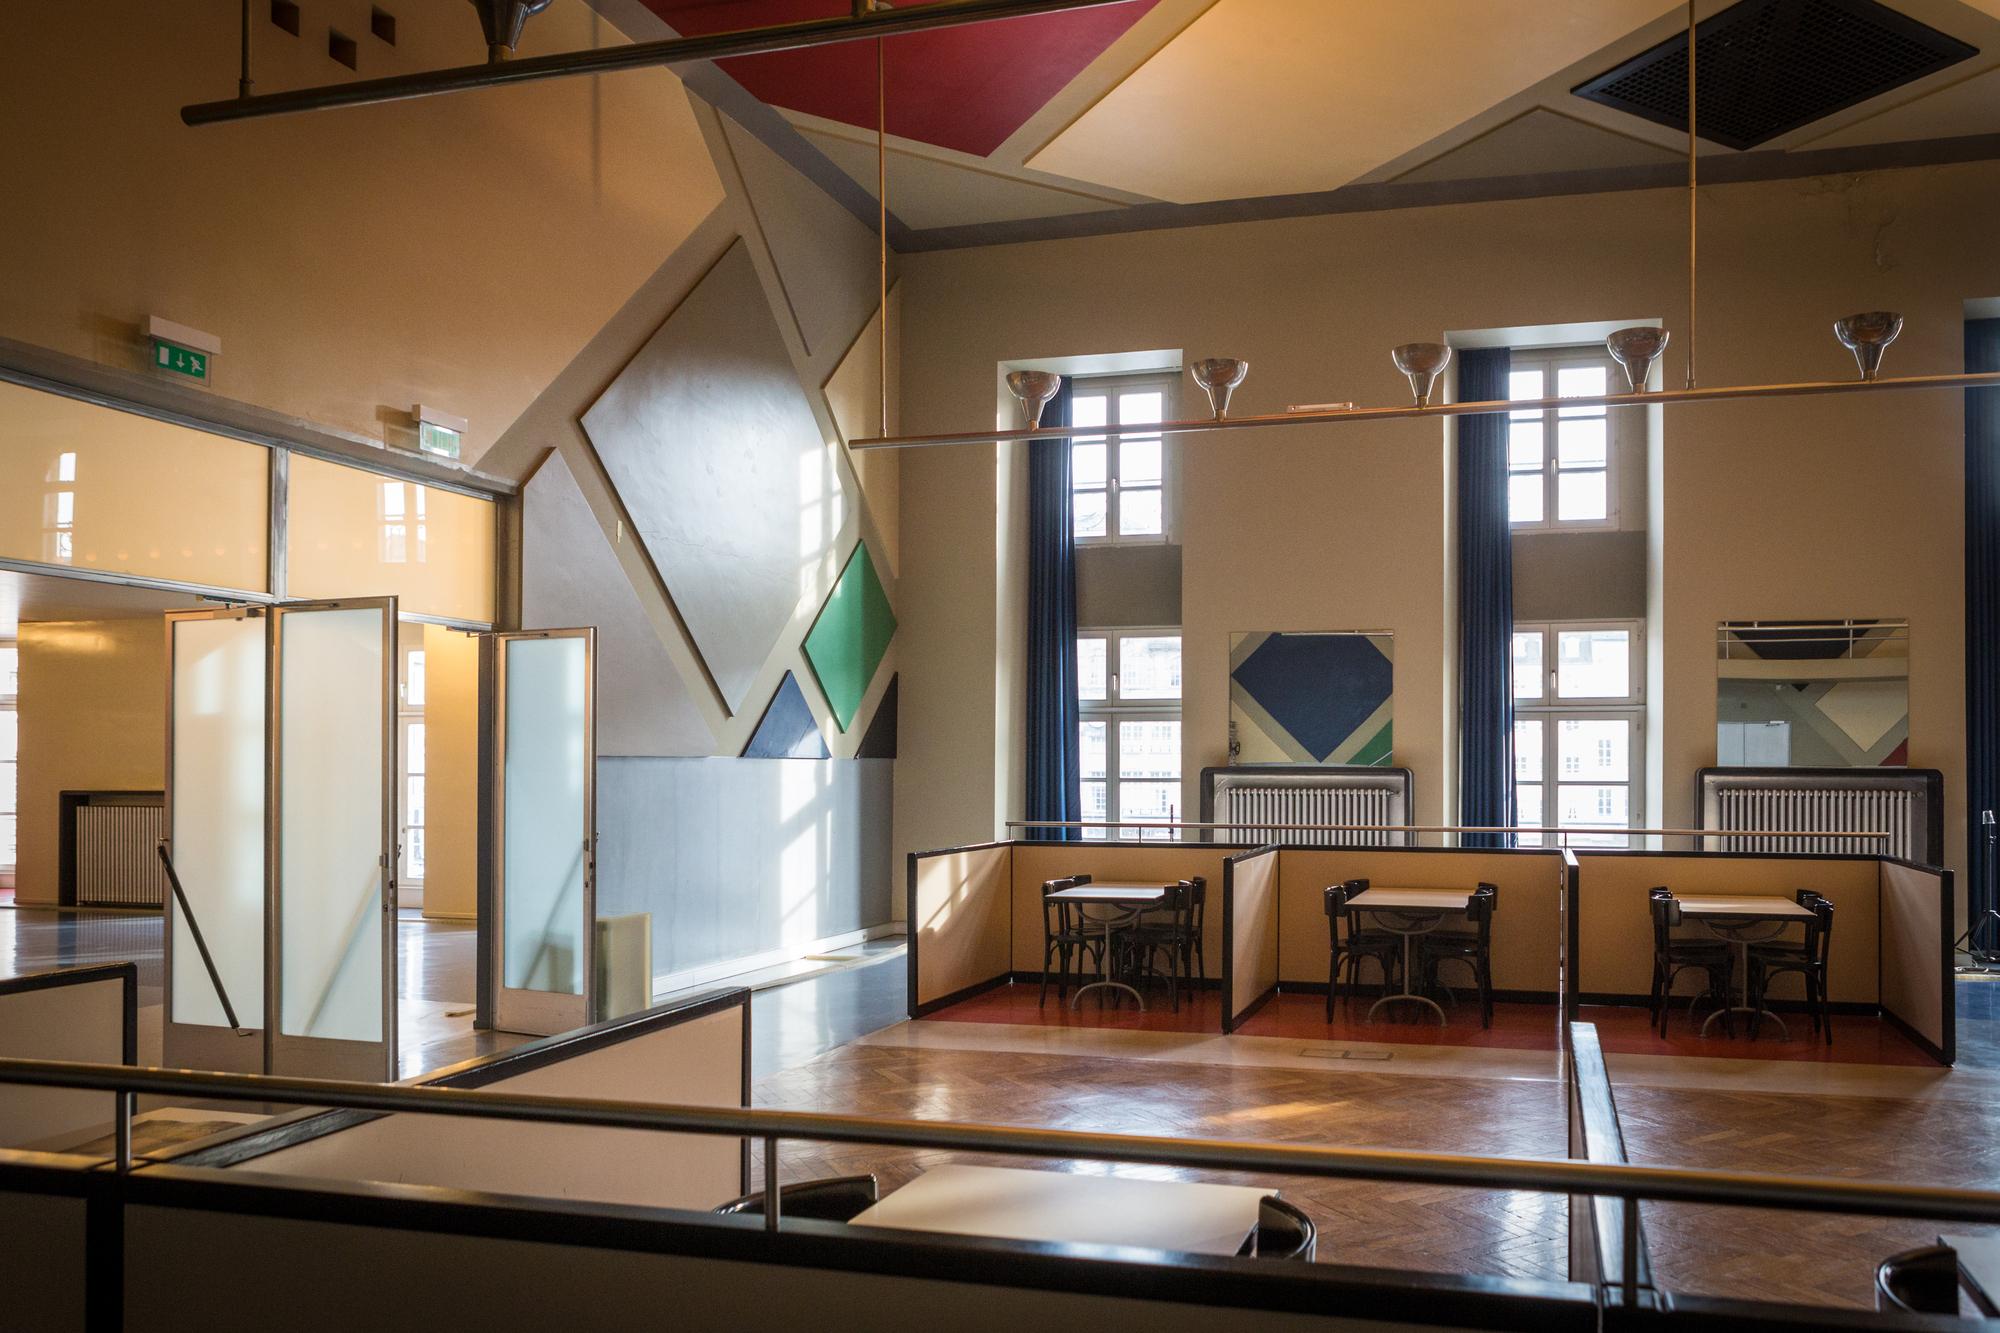 gallery of ad classics caf l 39 aubette theo van doesburg 7. Black Bedroom Furniture Sets. Home Design Ideas